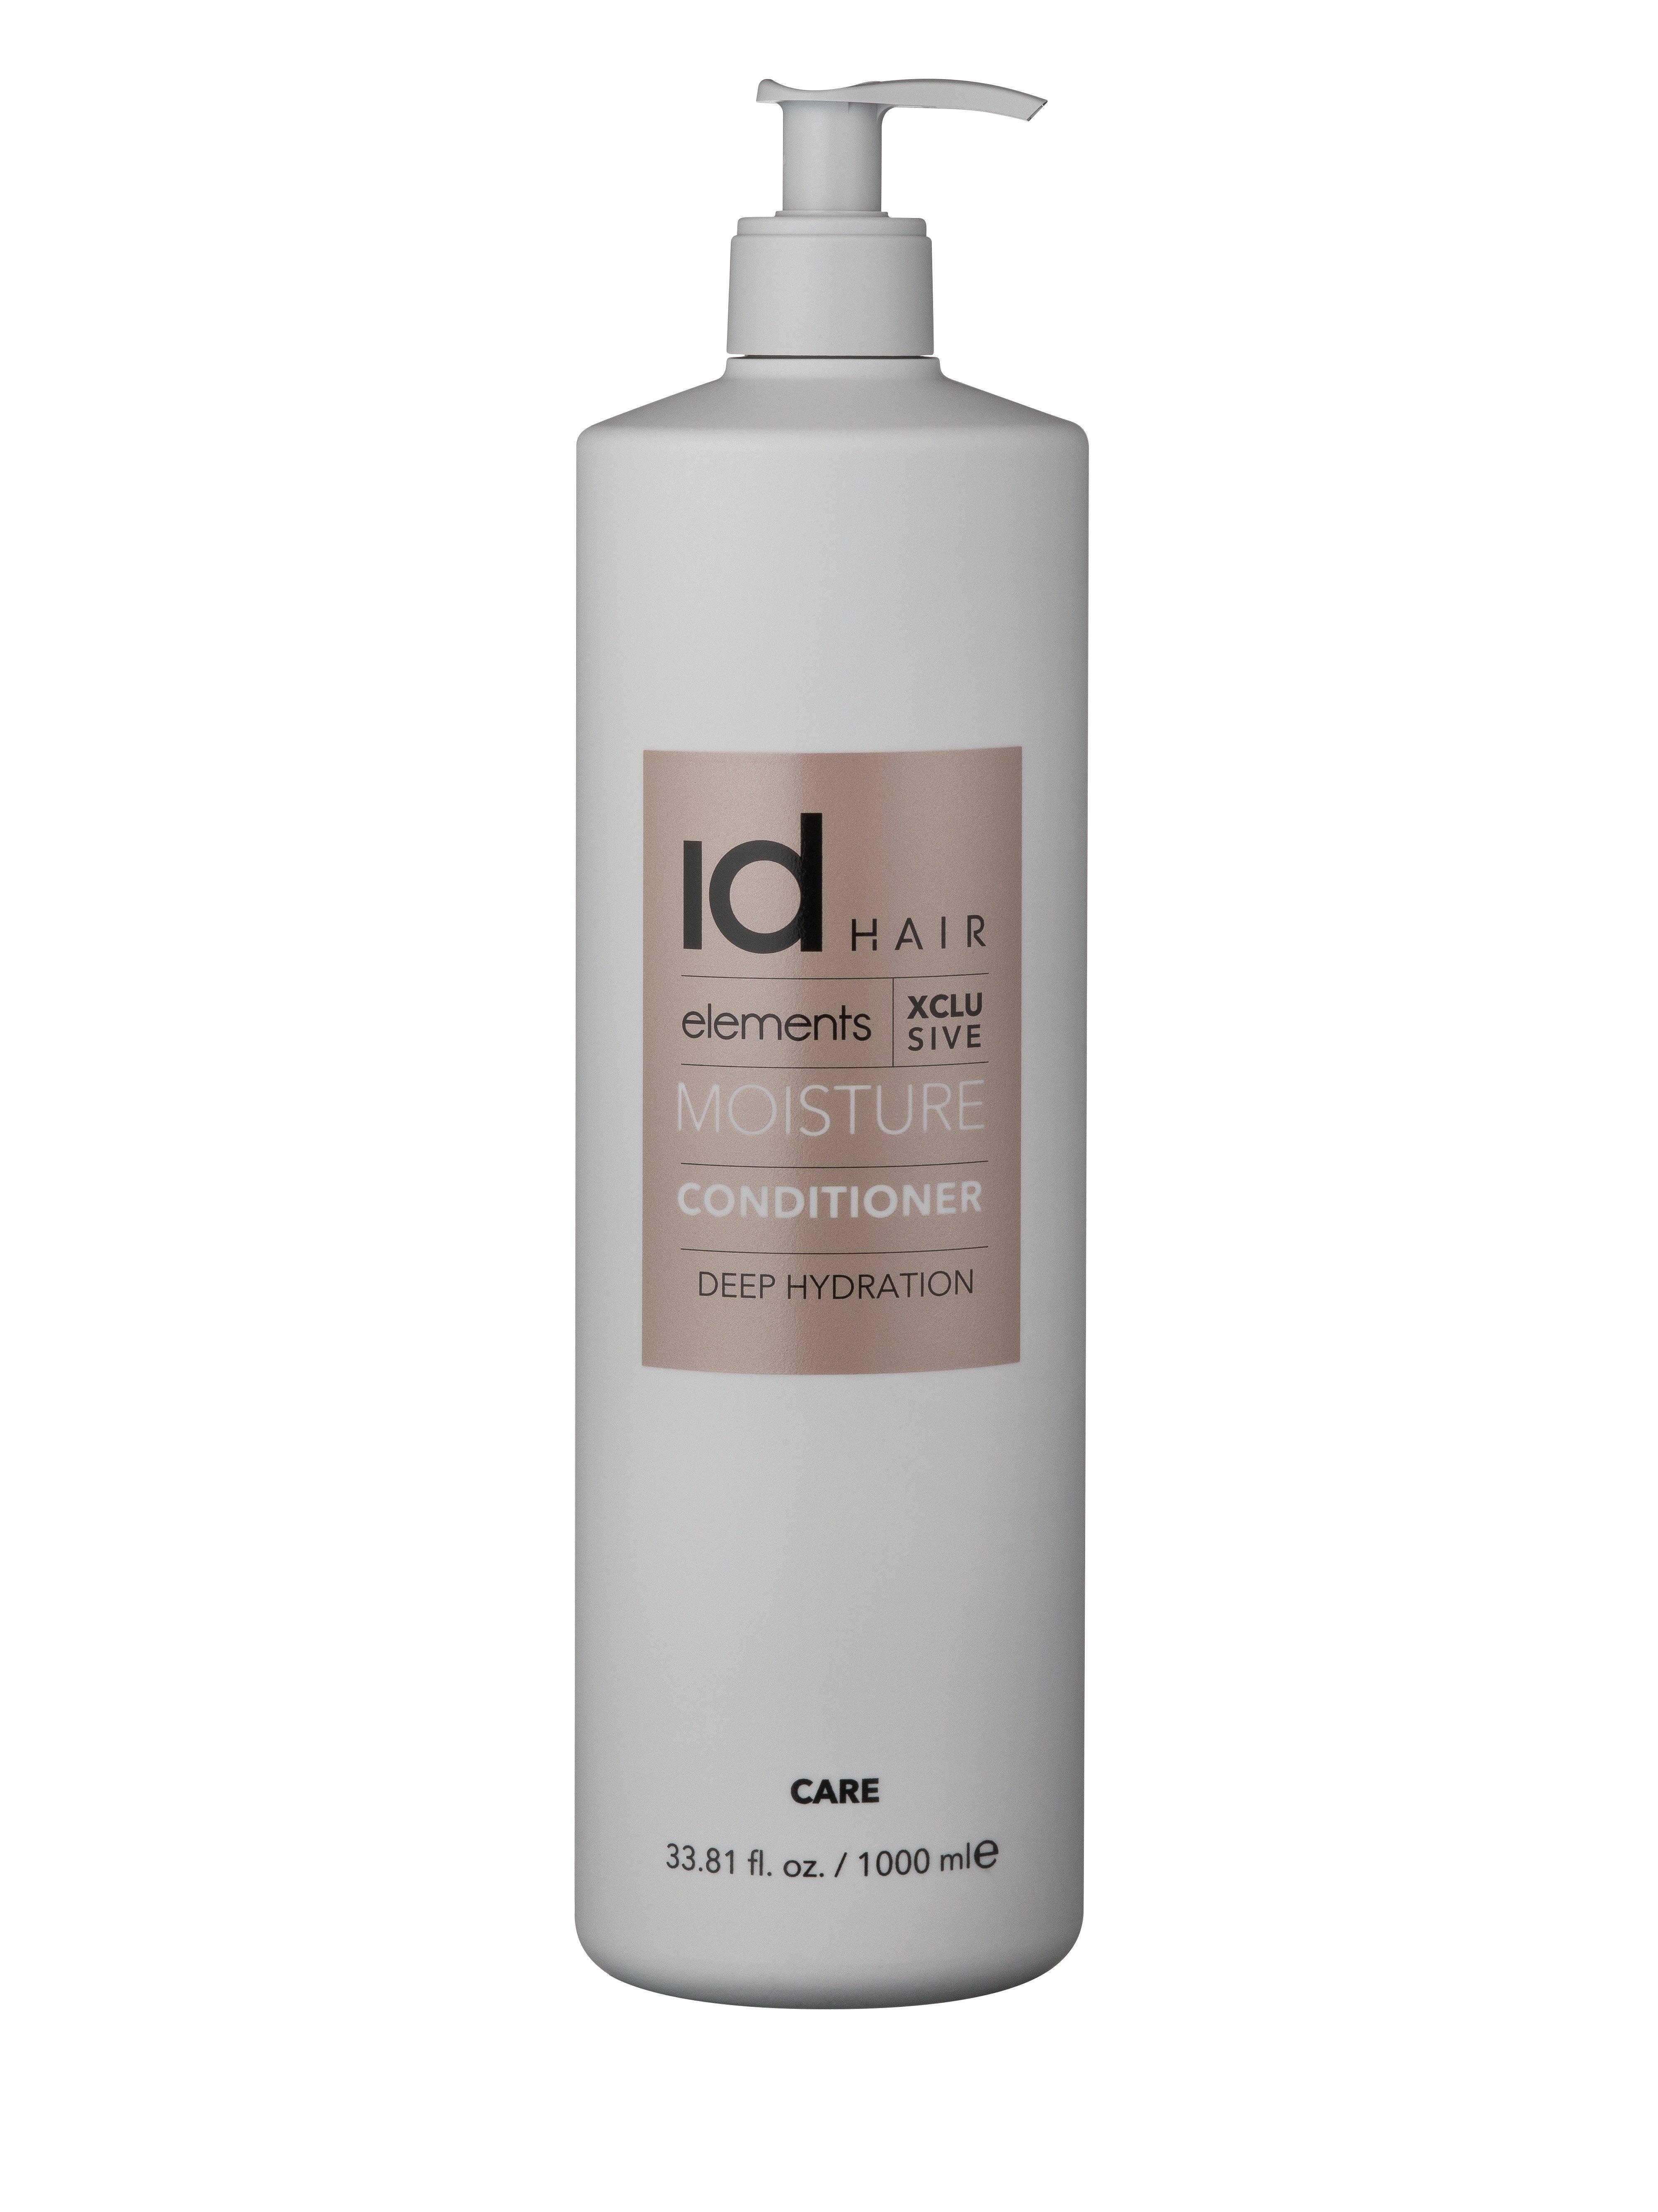 IdHAIR - Elements Xclusive Moisture Conditioner 1000 ml